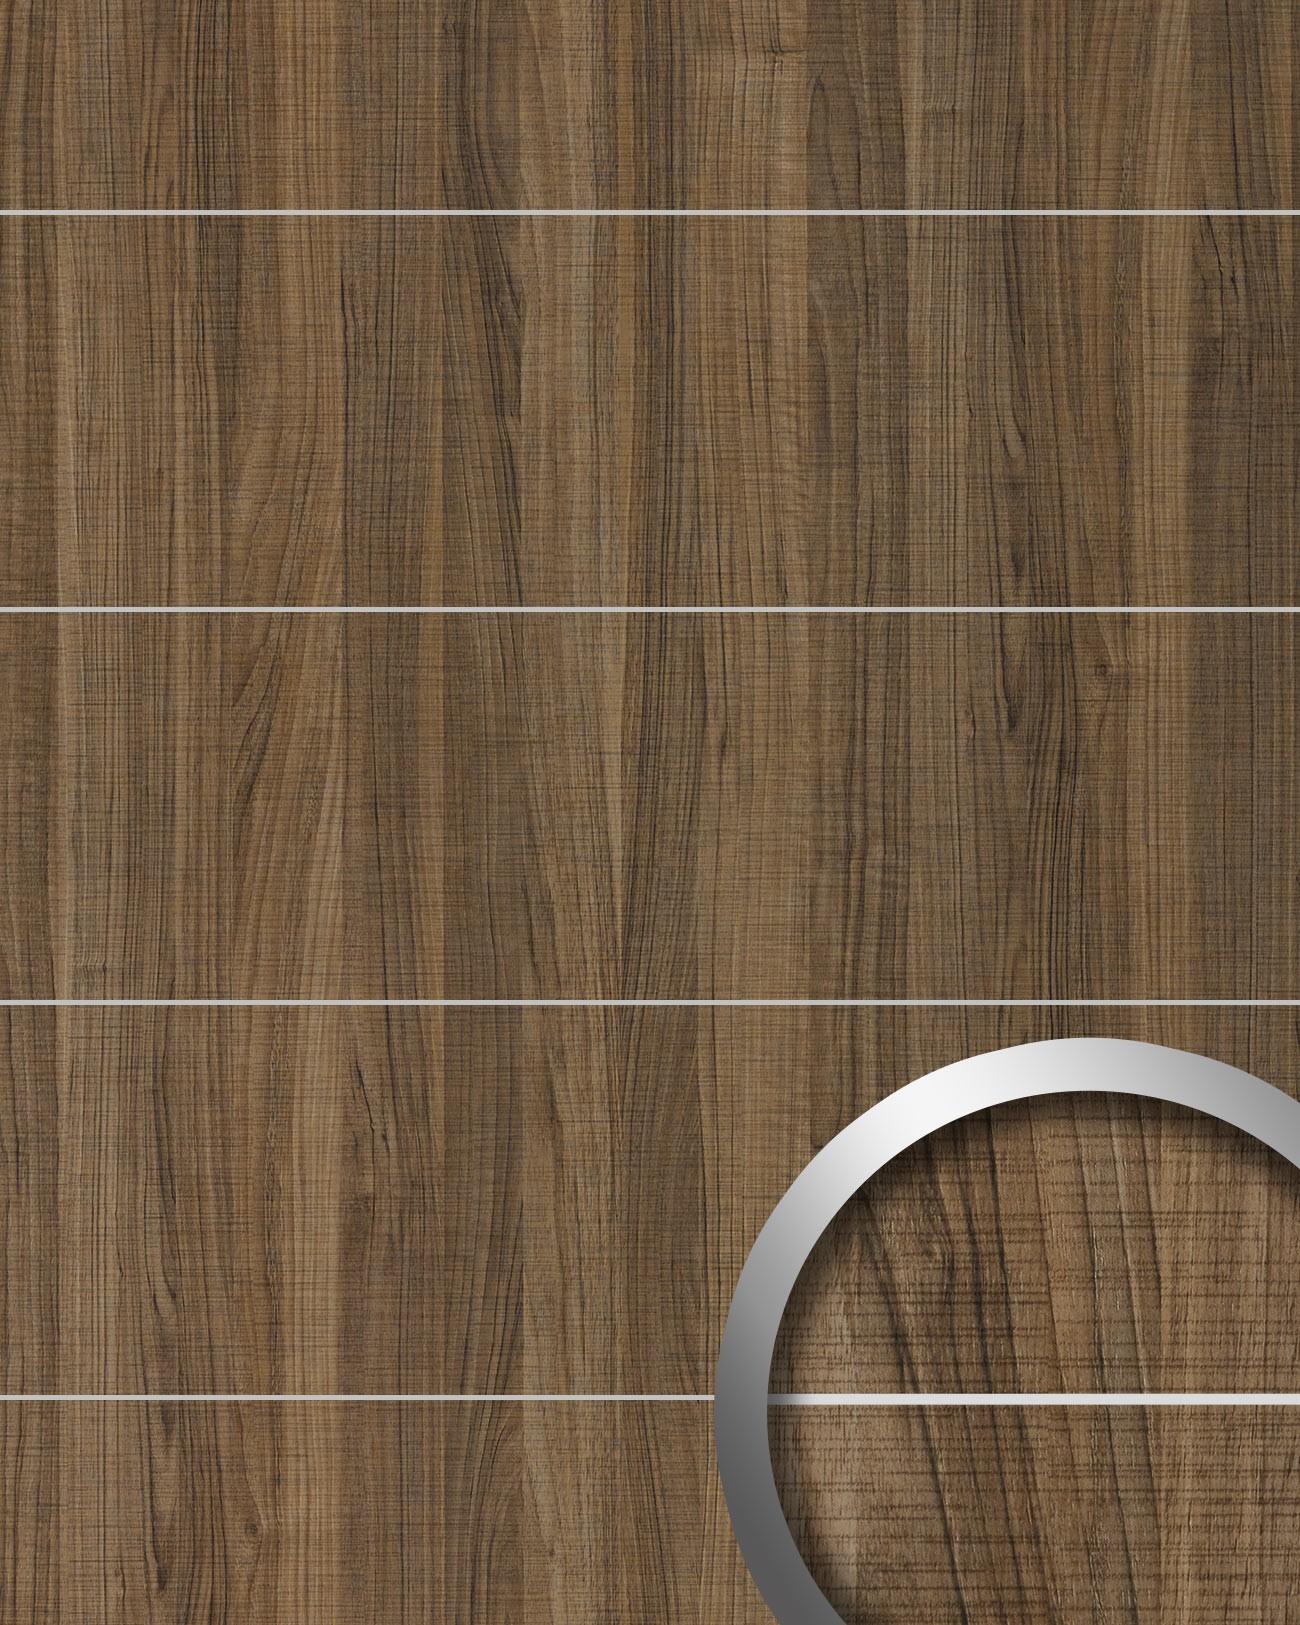 wandverkleidung holz optik wallface 19100 nutwood country 8l nussbaum dekor metall lisenen. Black Bedroom Furniture Sets. Home Design Ideas